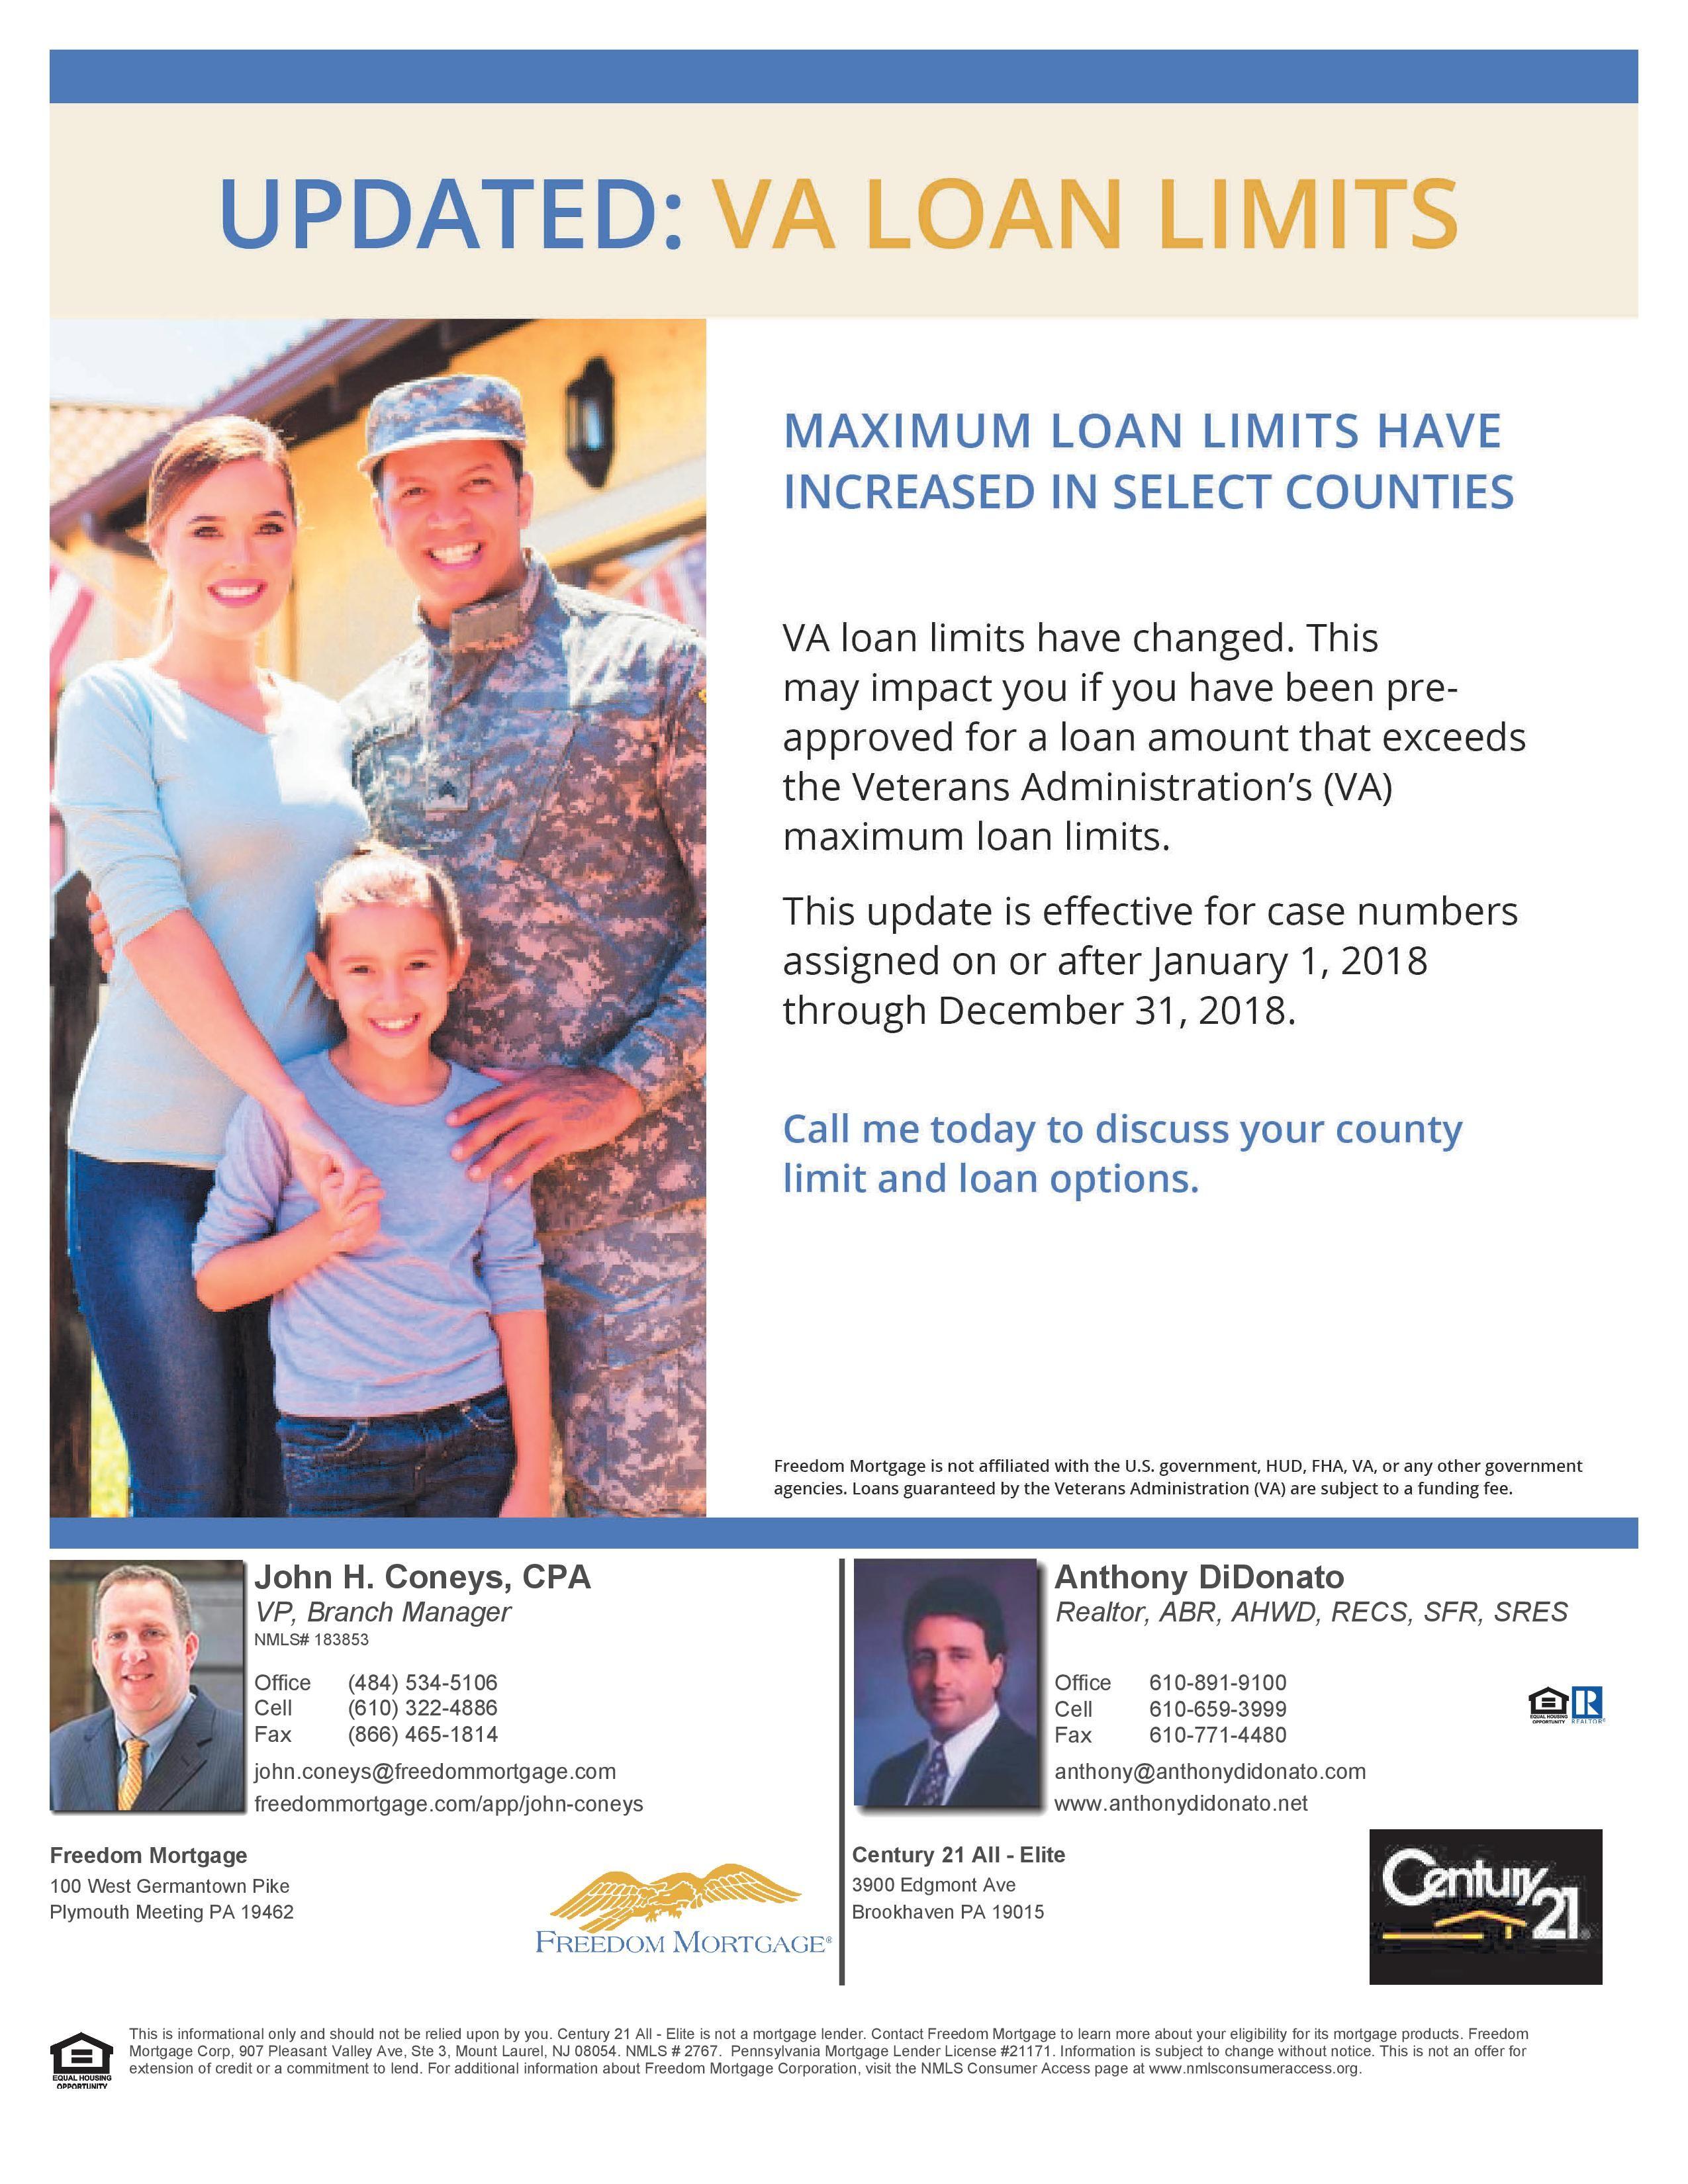 Va Loan Limits More Info Here Http Www Anthonydidonato Net Wordpress 2018 05 16 Va Loan Limits Va Loan Veterans Administration Loan